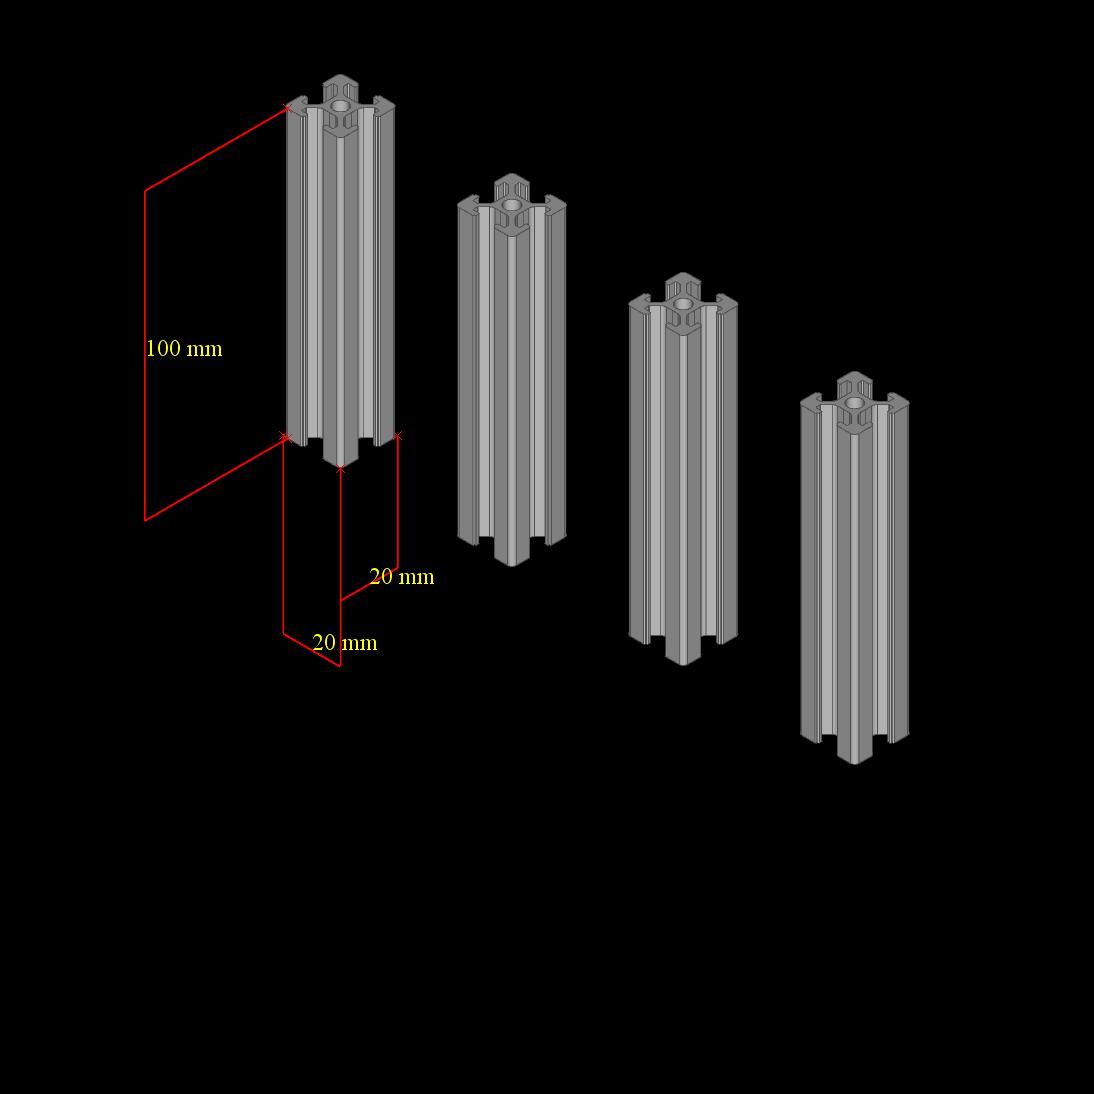 Aluminum T-slot extruded framing profile 20x40 Metric Series Length Choose